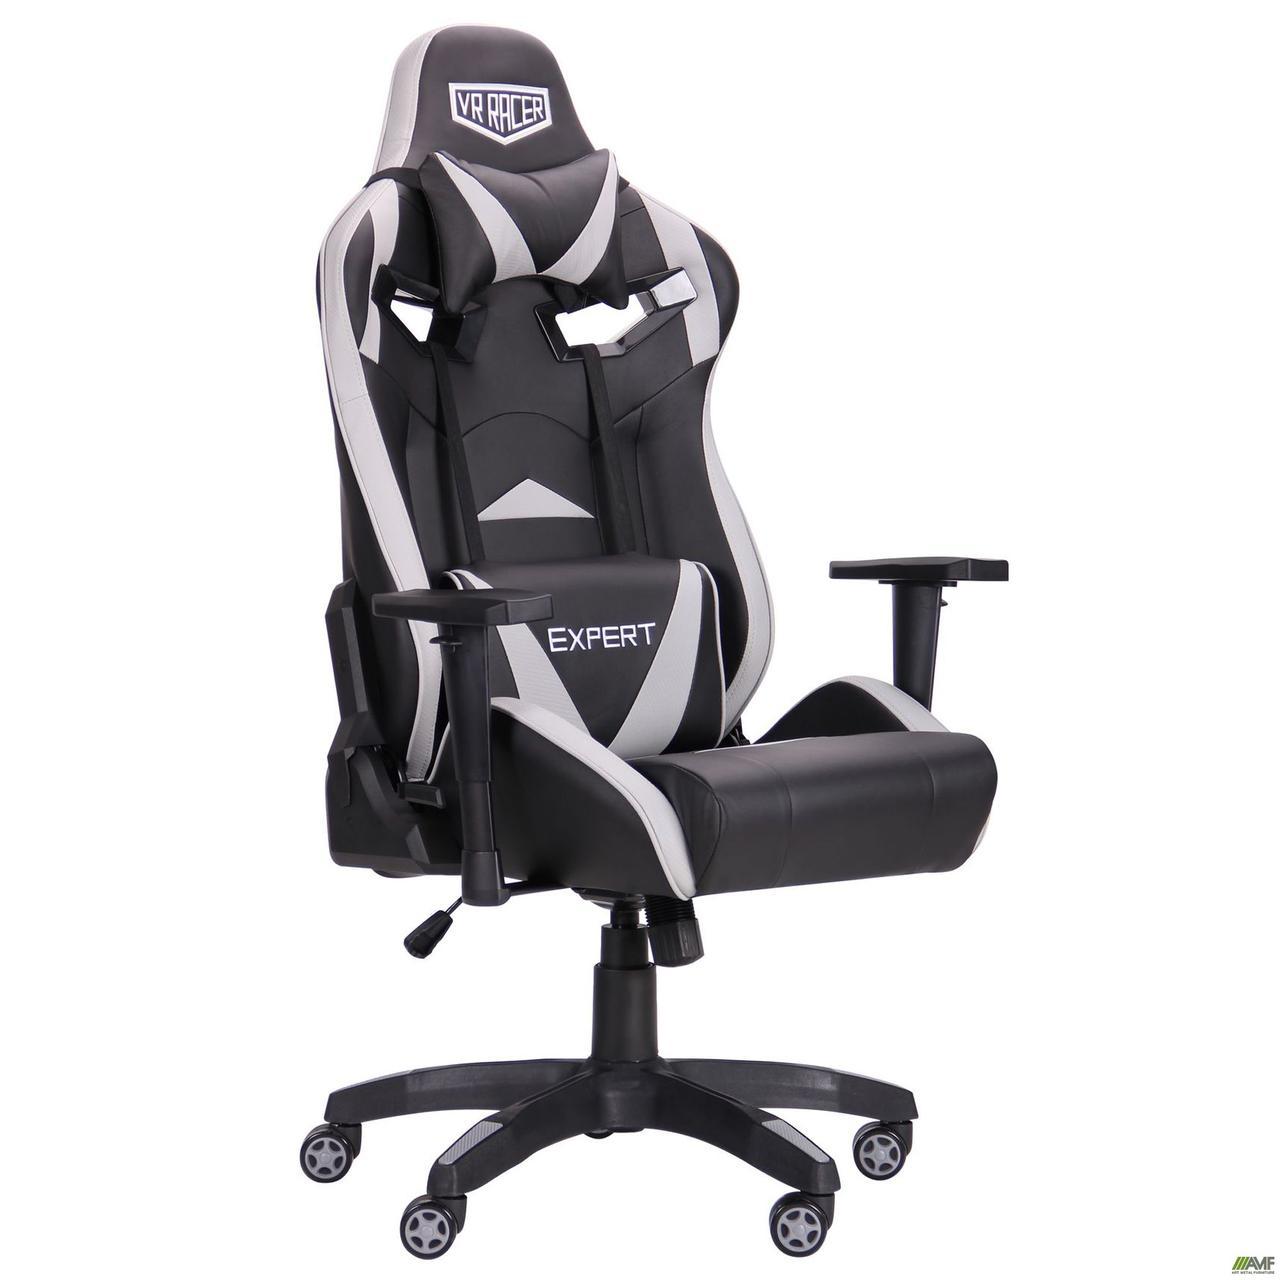 Кресло VR Racer Expert Wizard черный/серый TM AMF